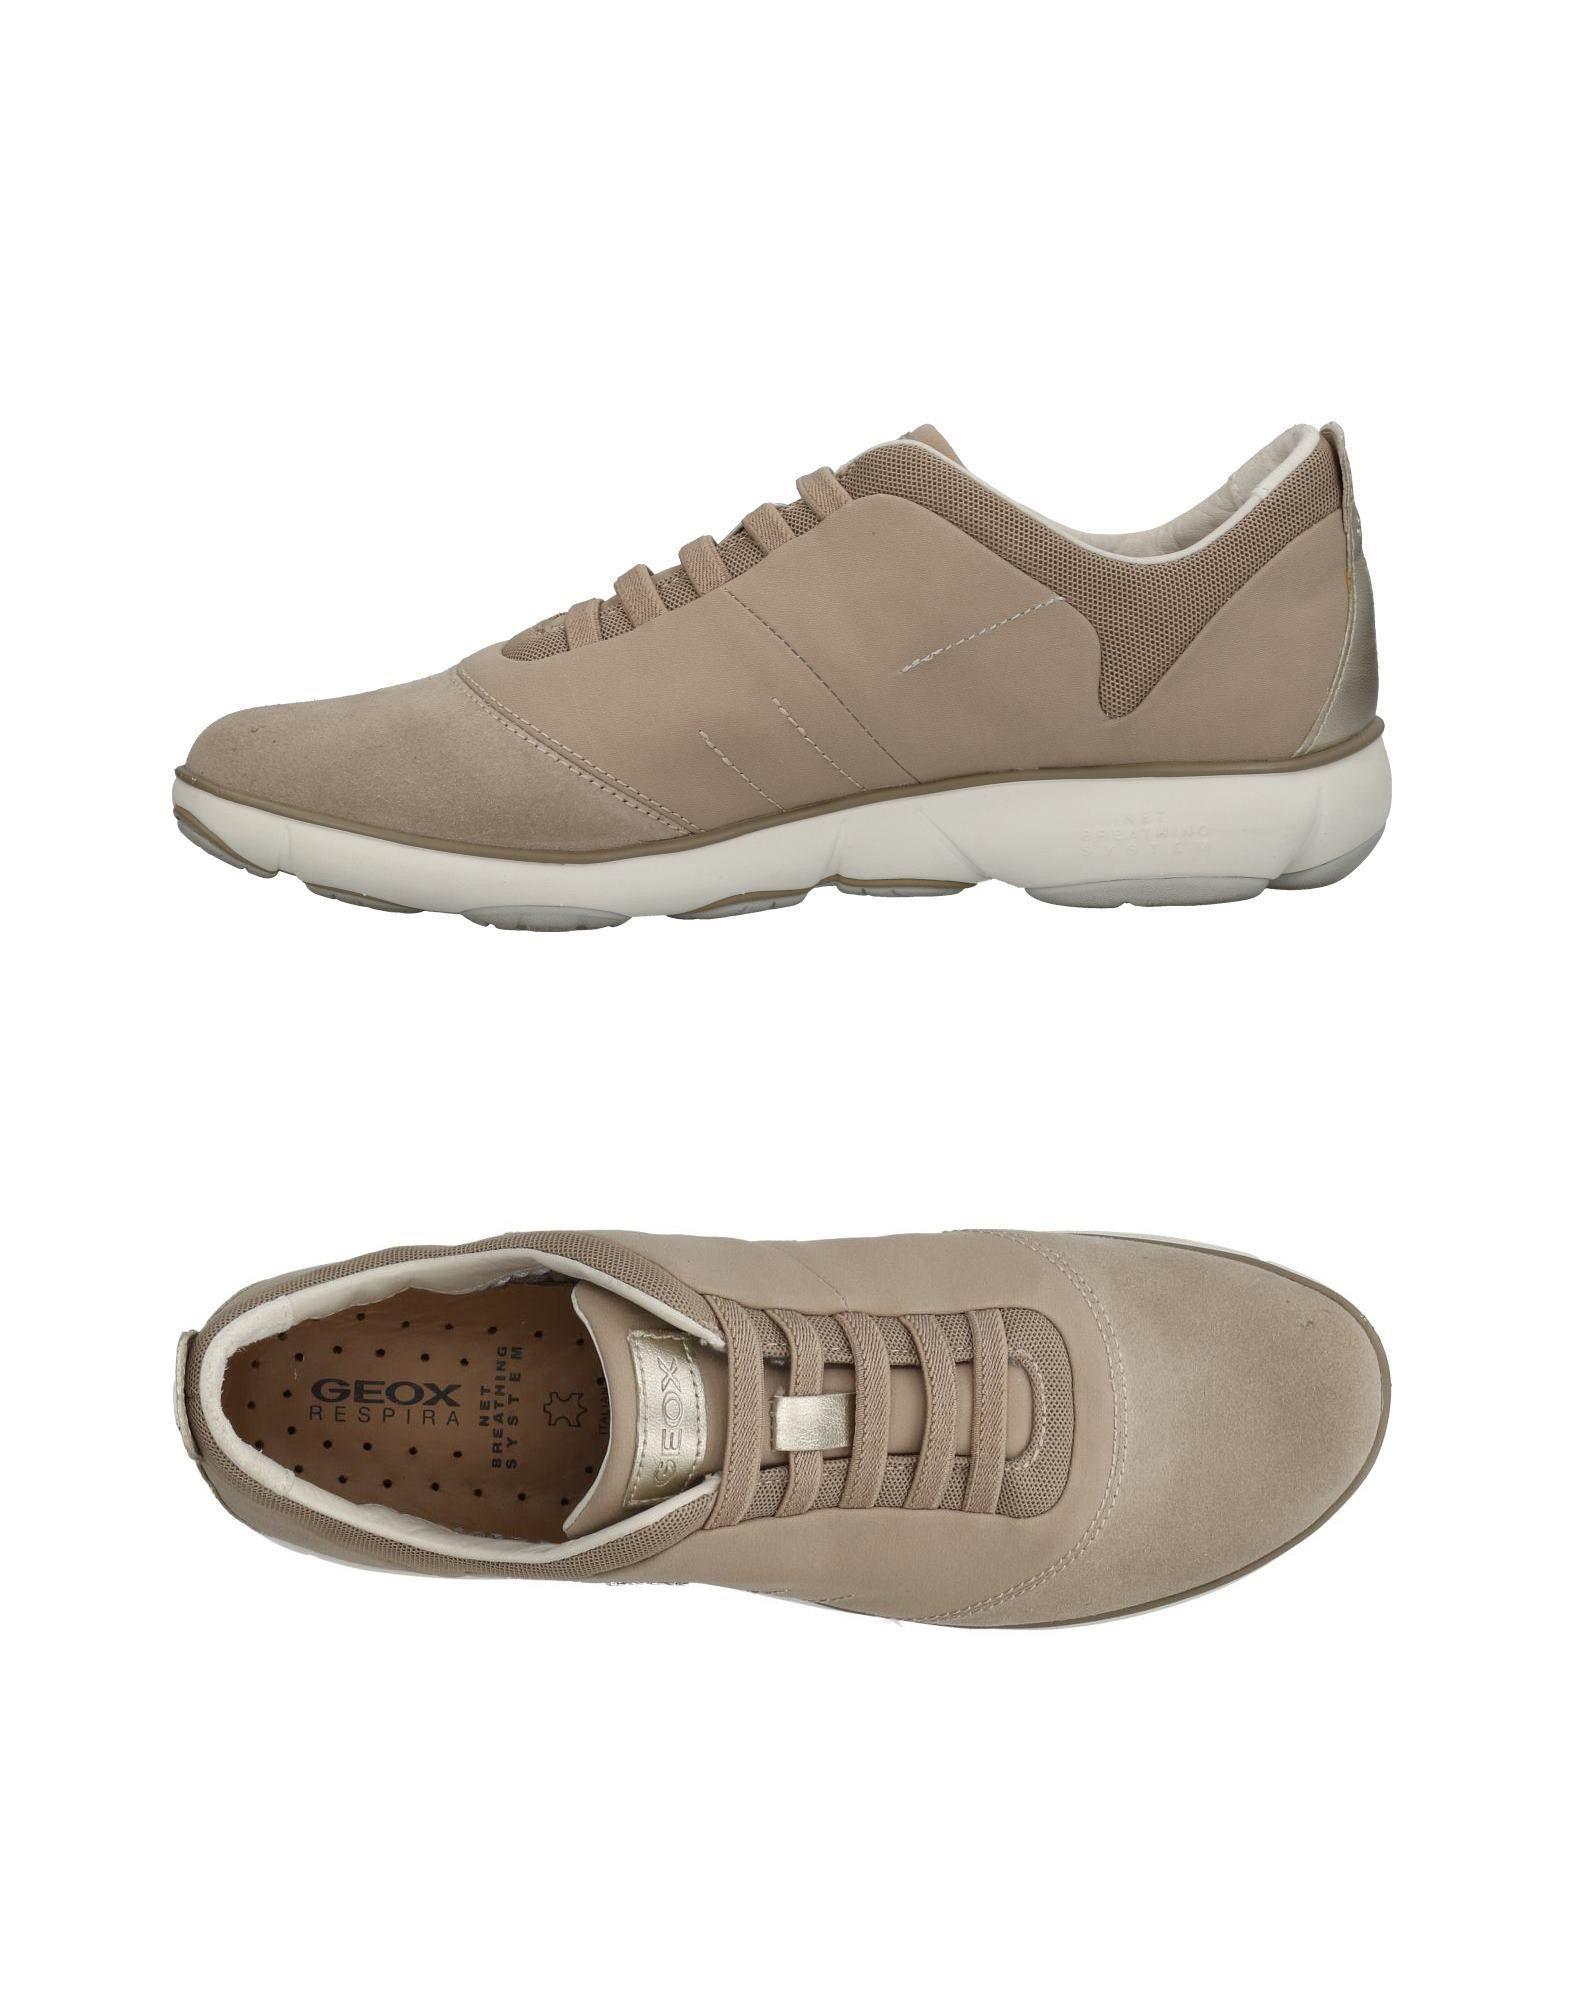 Geox Sneakers Damen  11464470RO Gute Qualität beliebte Schuhe